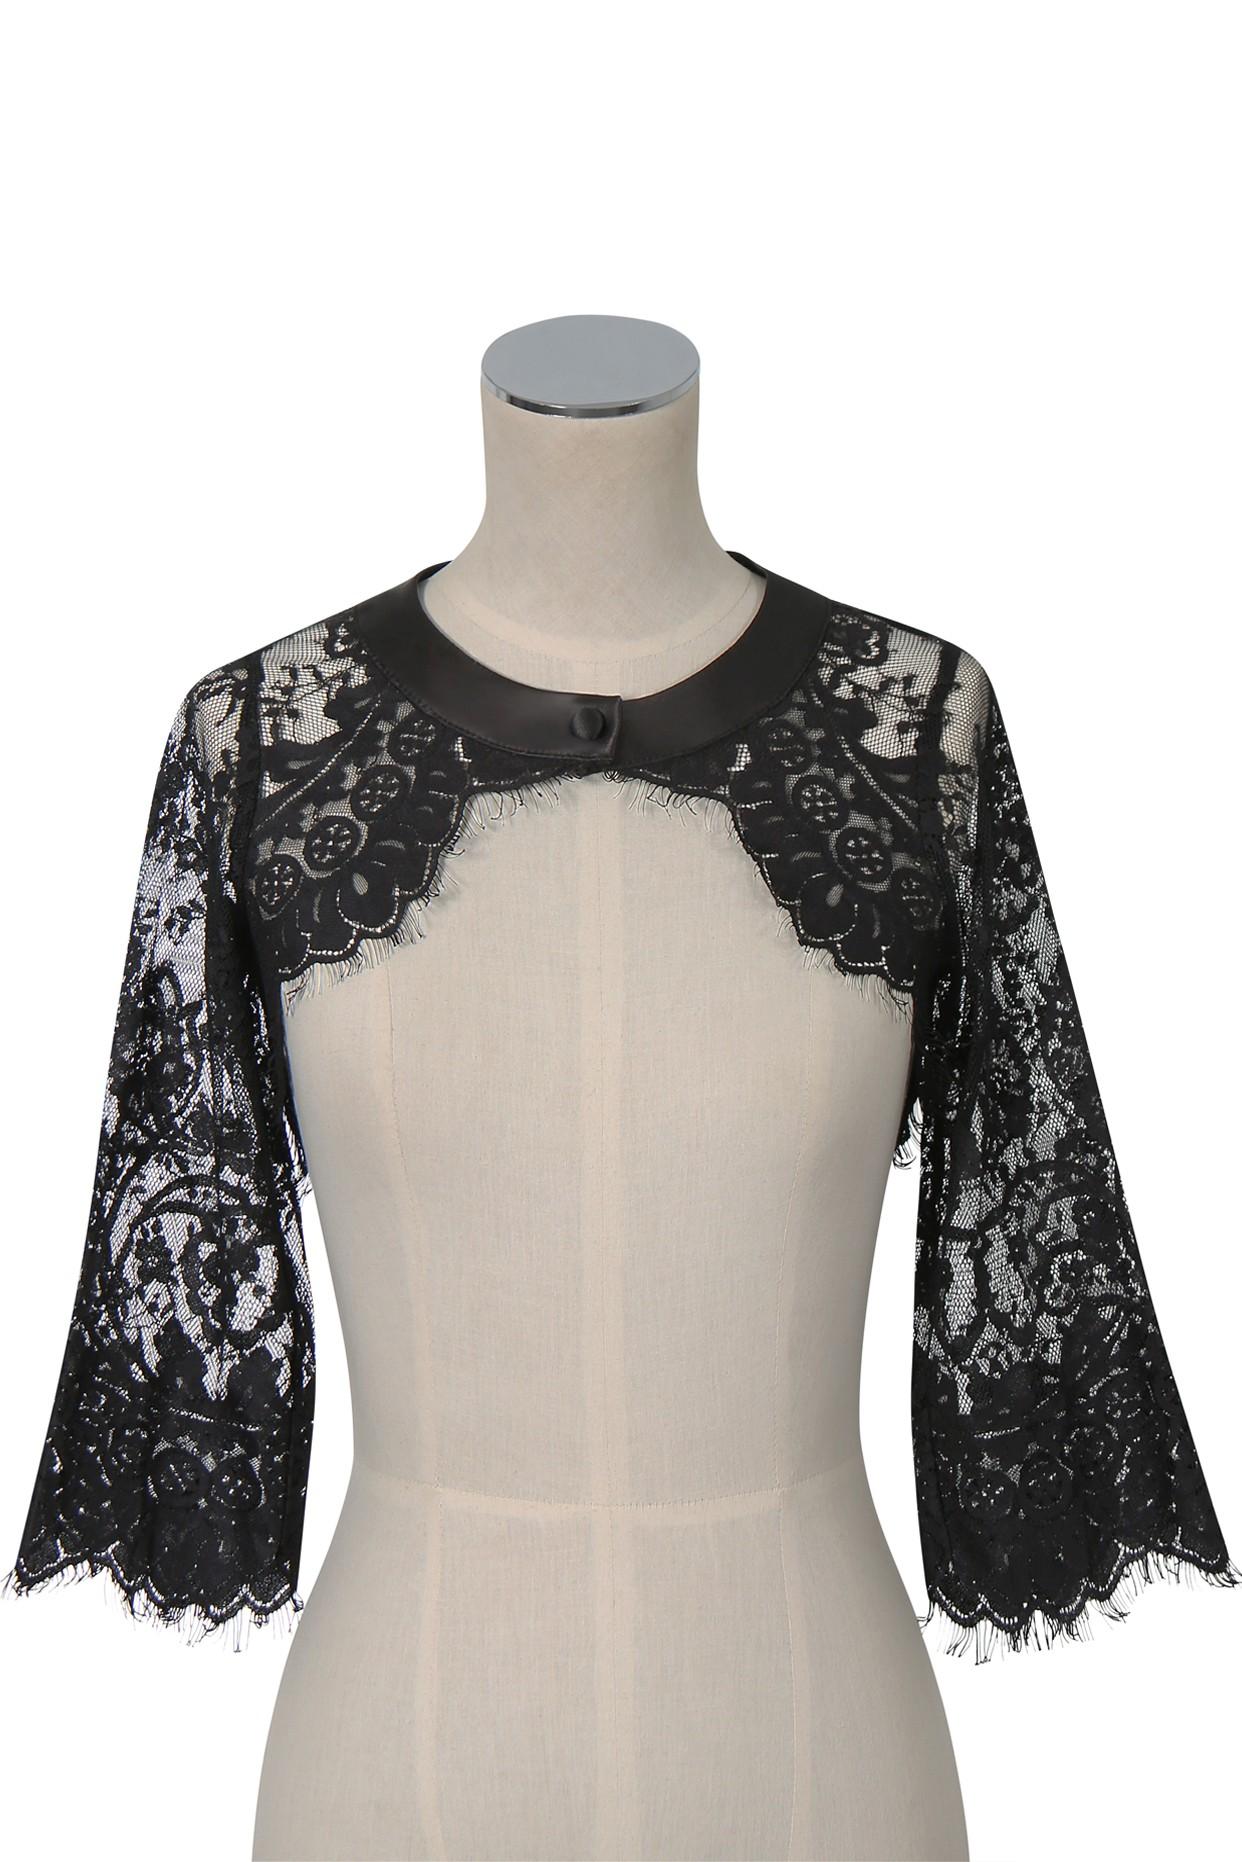 Cream Shrug | Lace Shrug | Lace Shrugs for Dresses